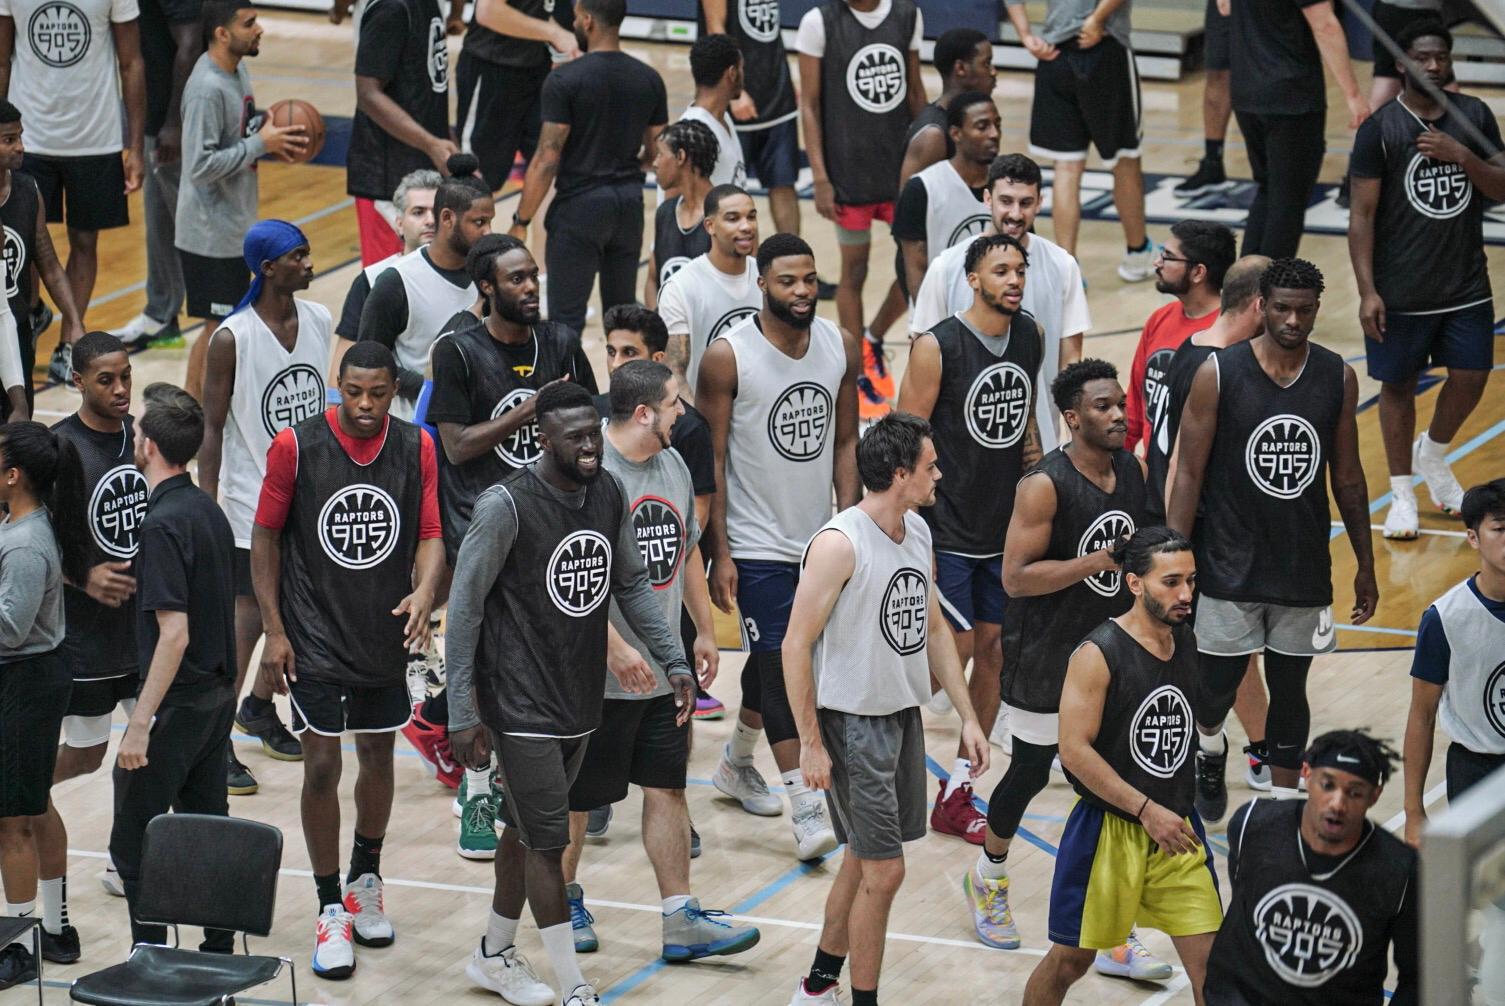 Raptors 905 open tryout yields almost 100 aspiring NBA G League ballers